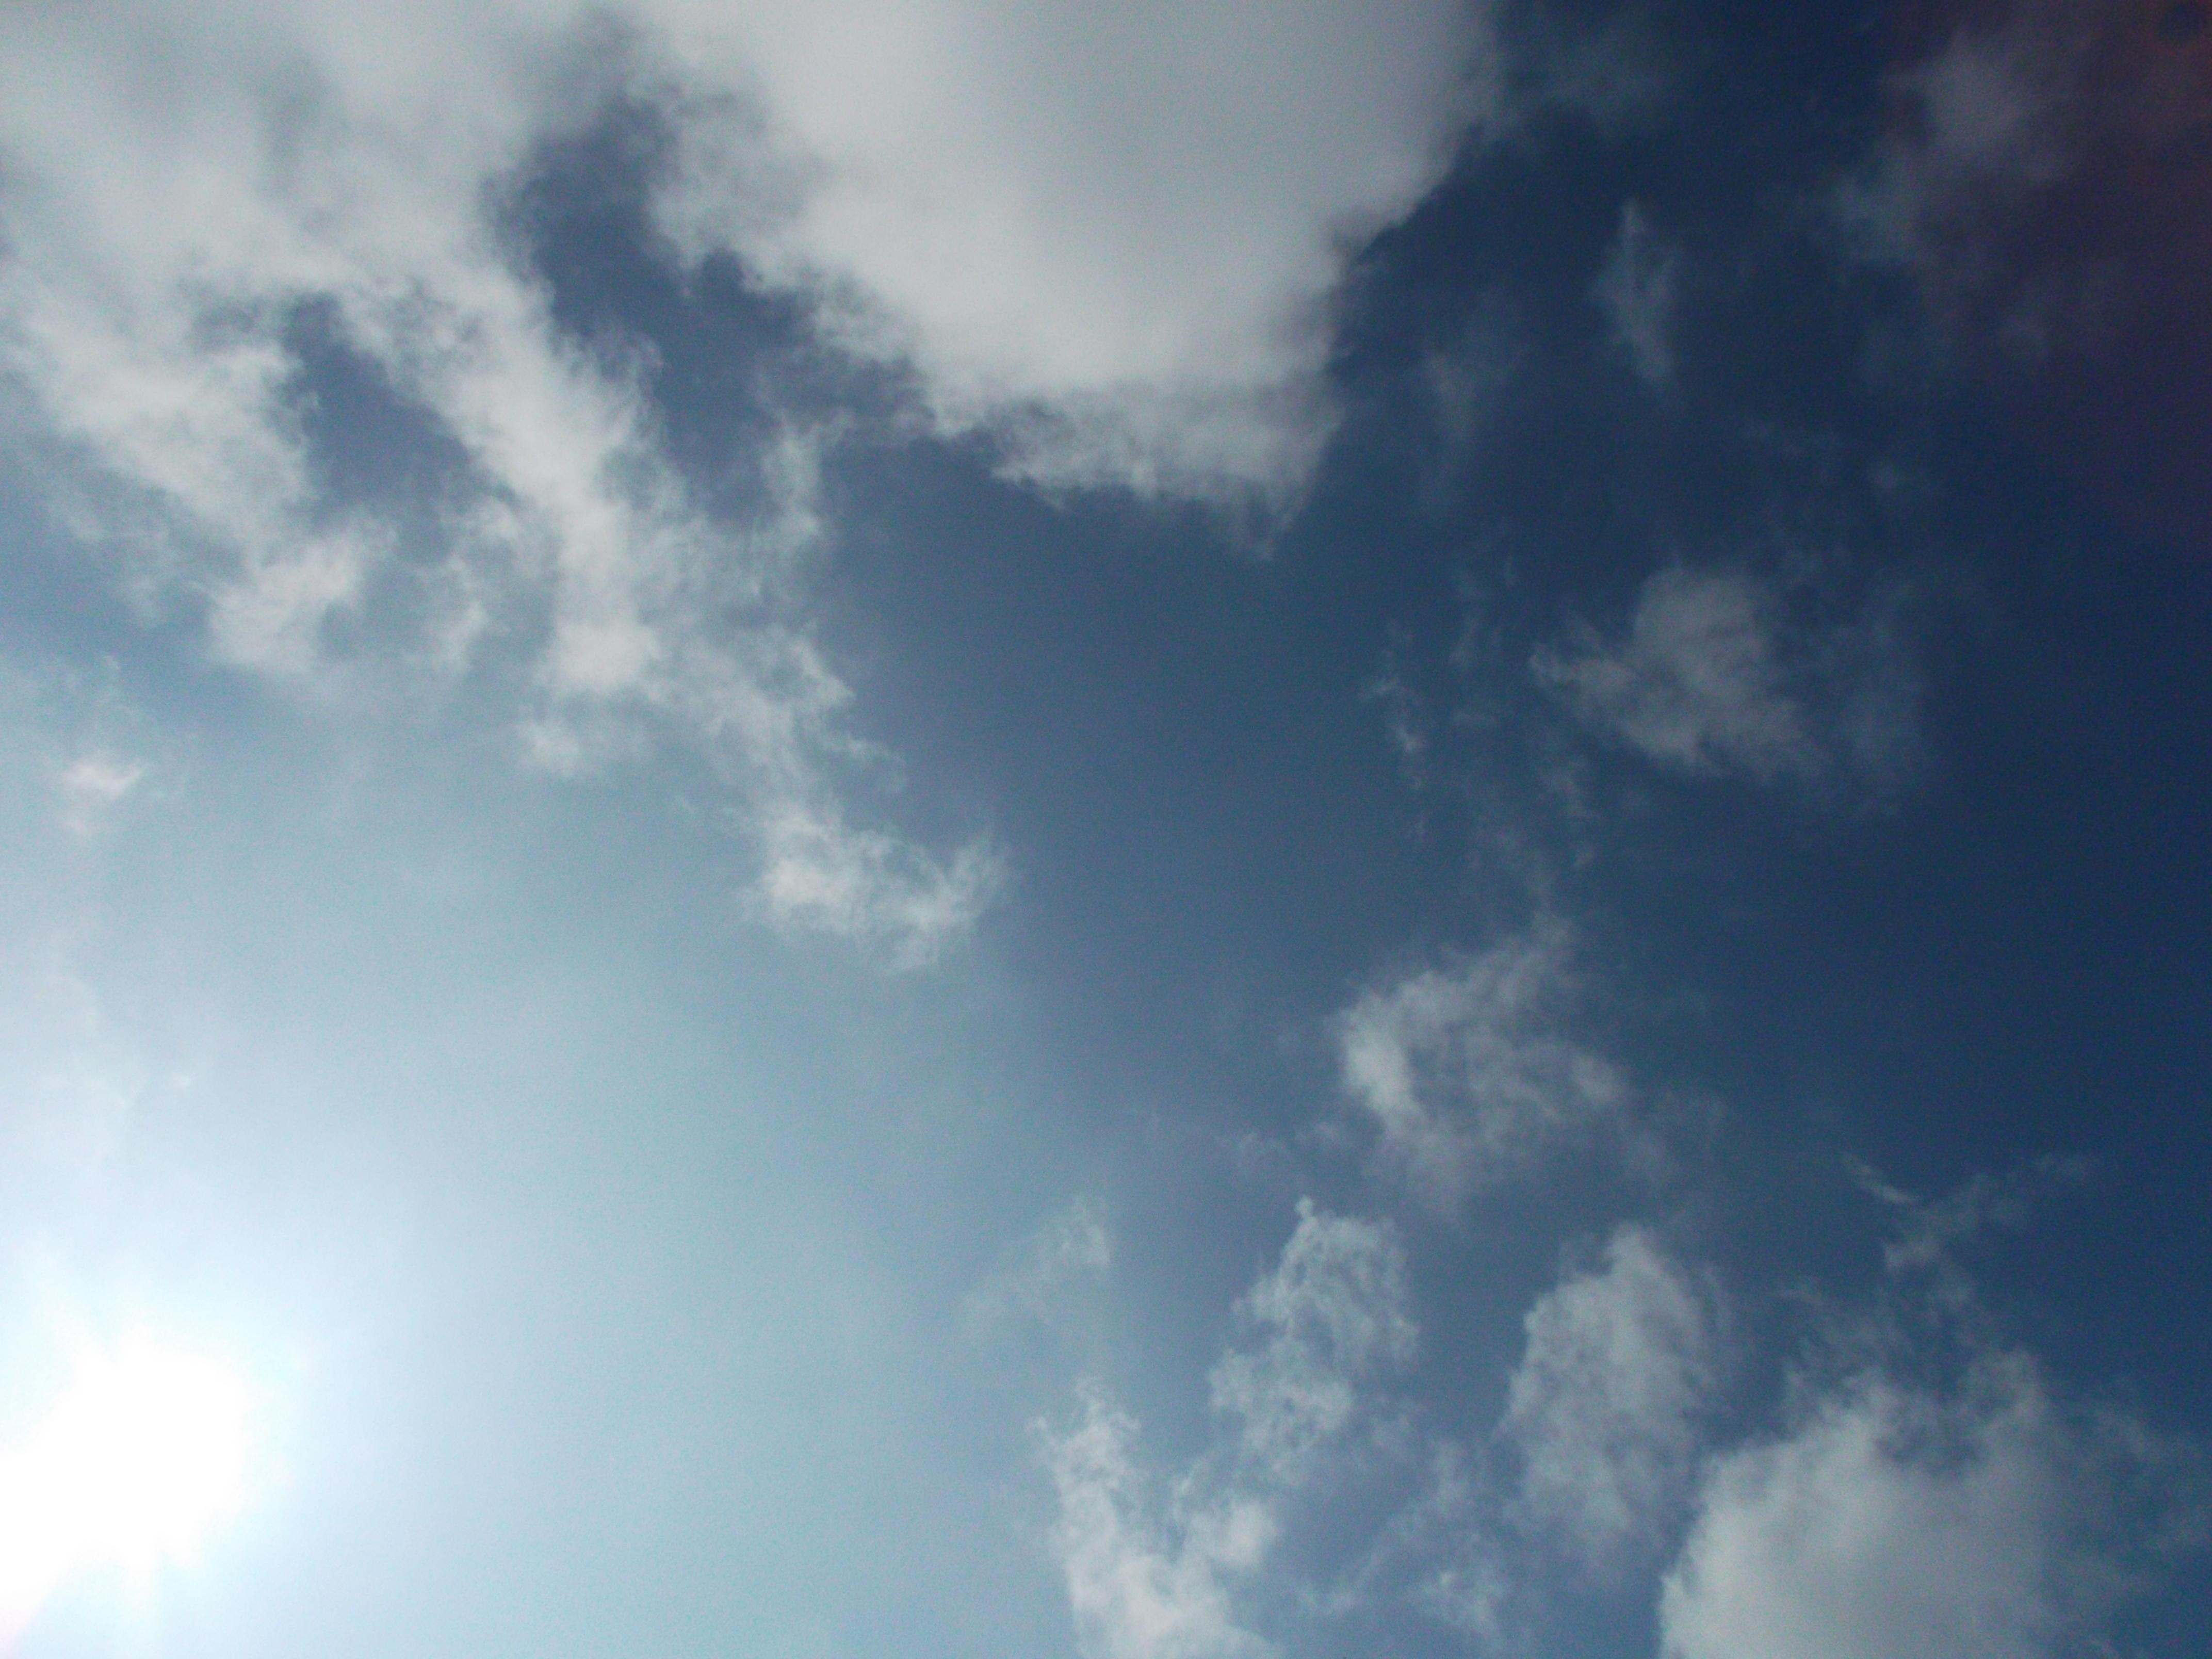 2013-04-08 Longitude -0.371 Latitude 49.182 Altitude 29 Heure 15h19